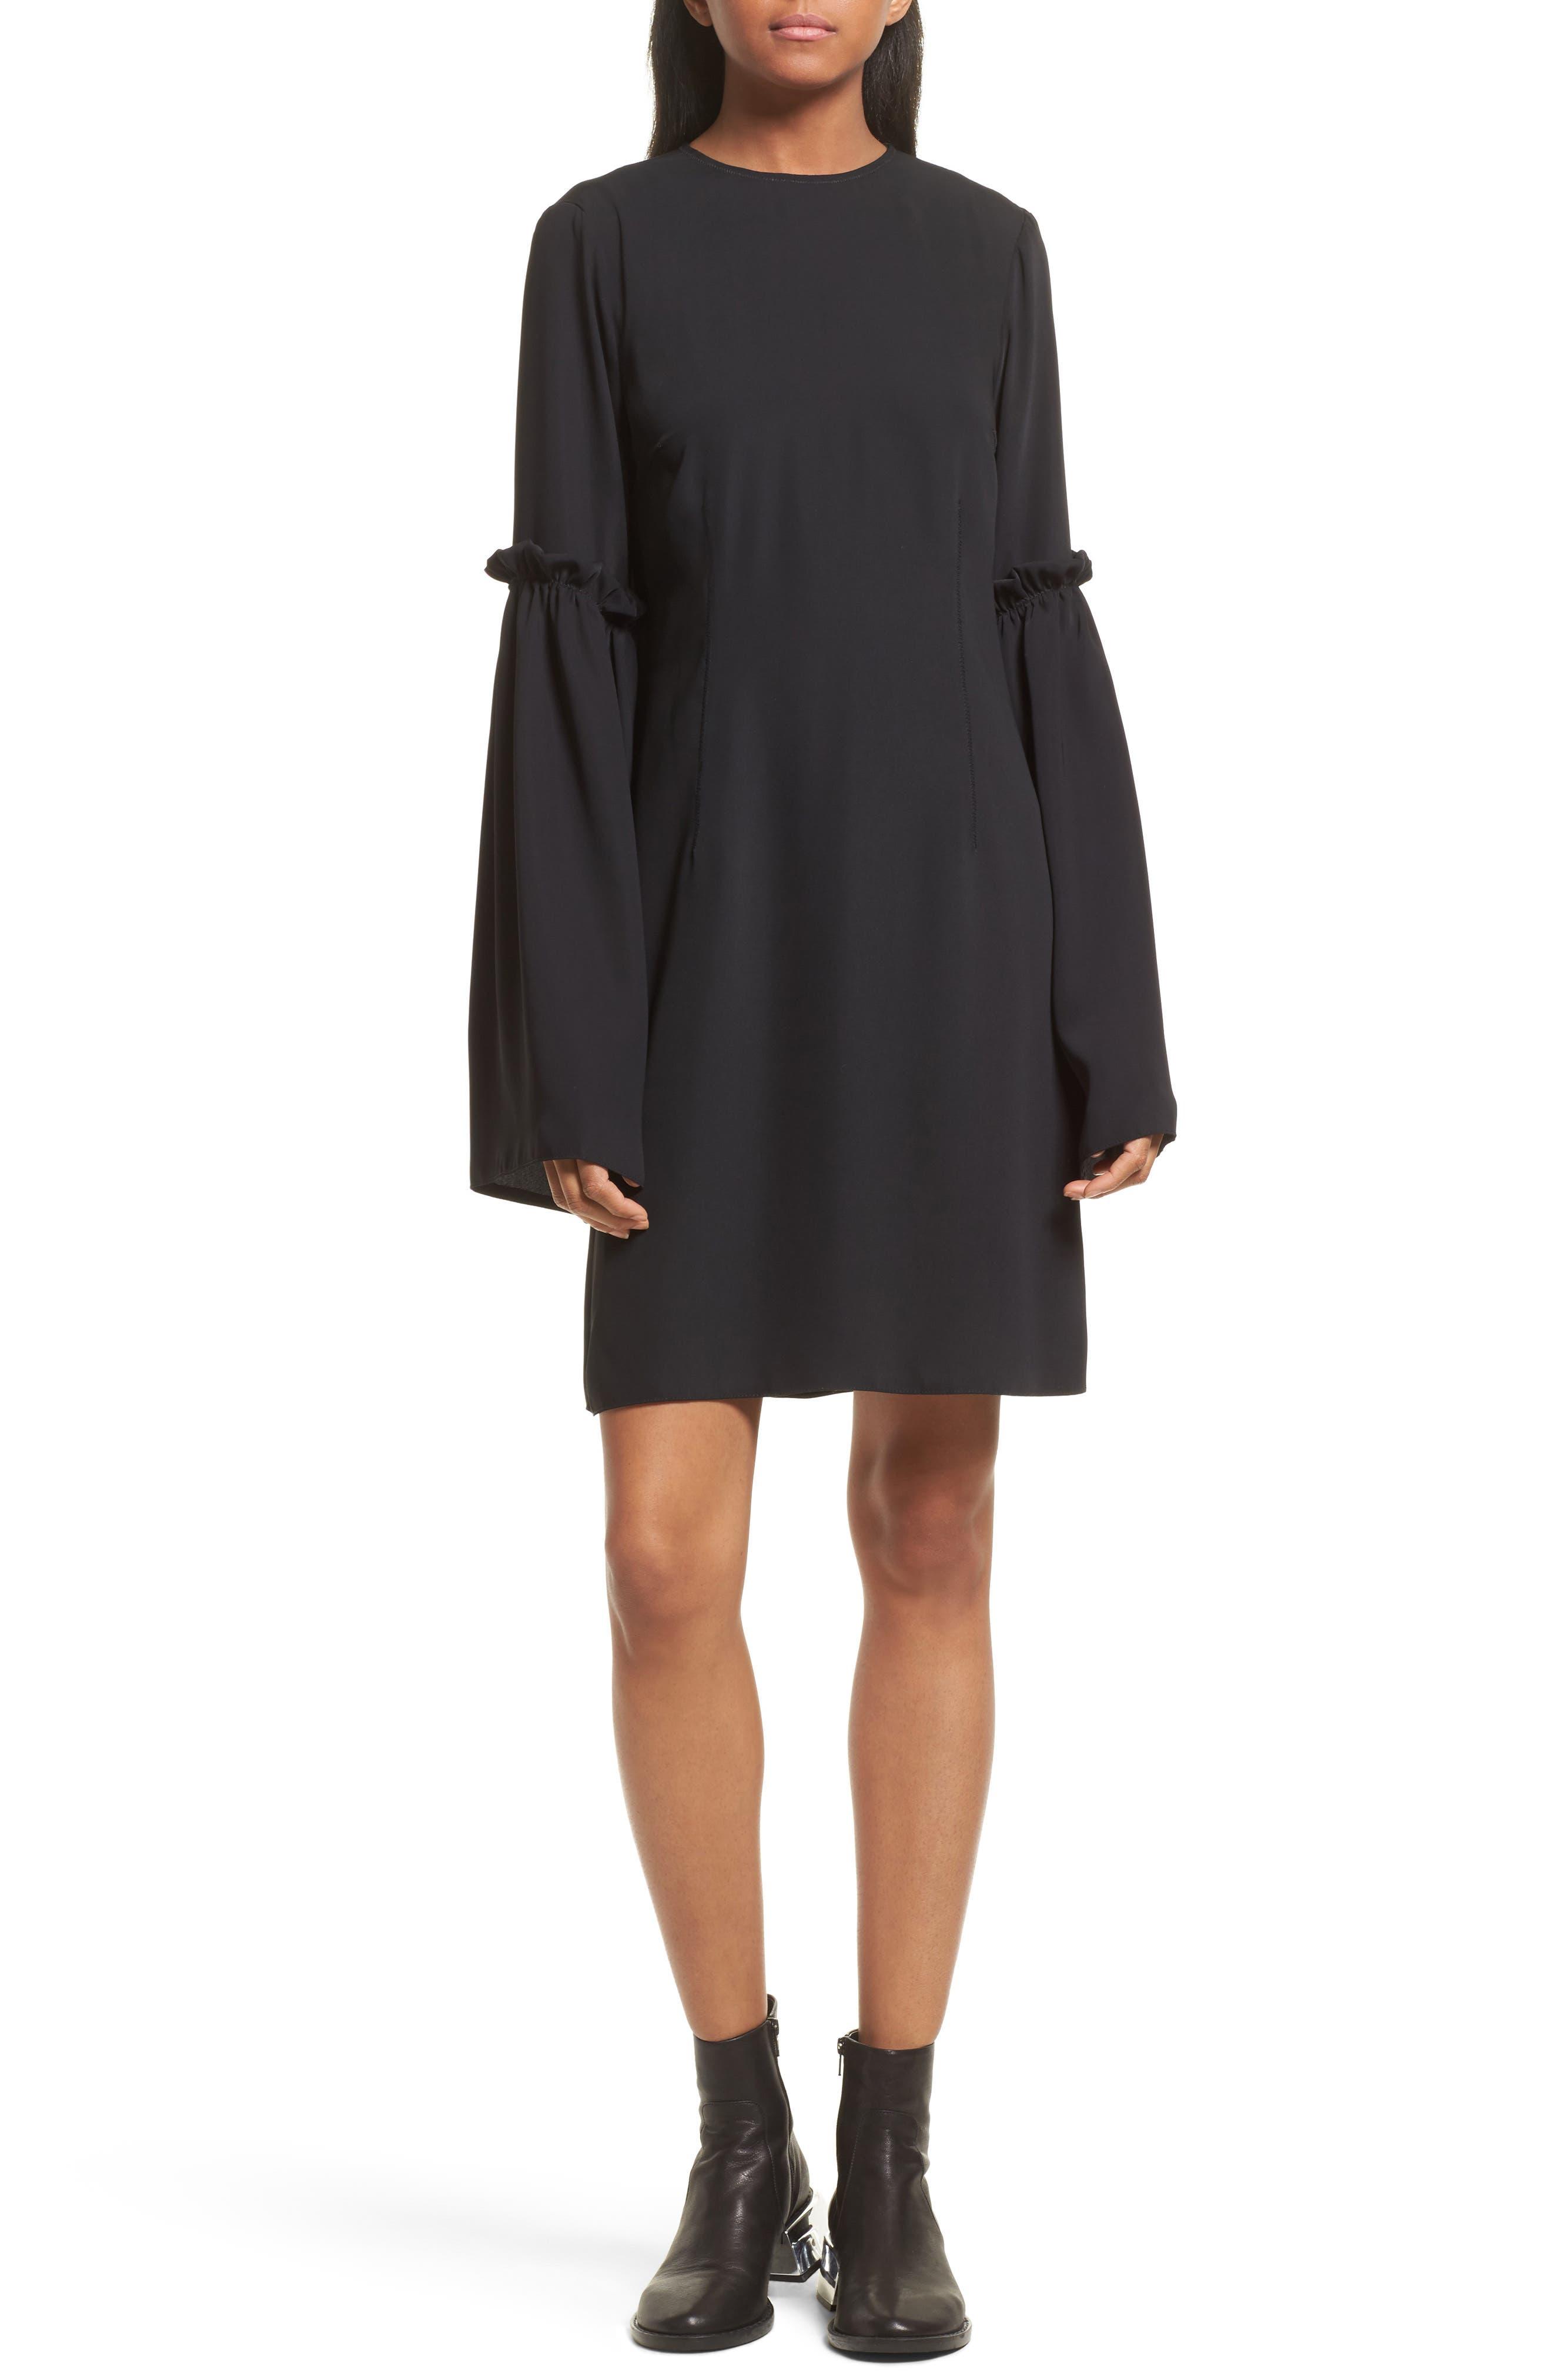 MM6 Maison Margiela Bell Sleeve Shift Dress